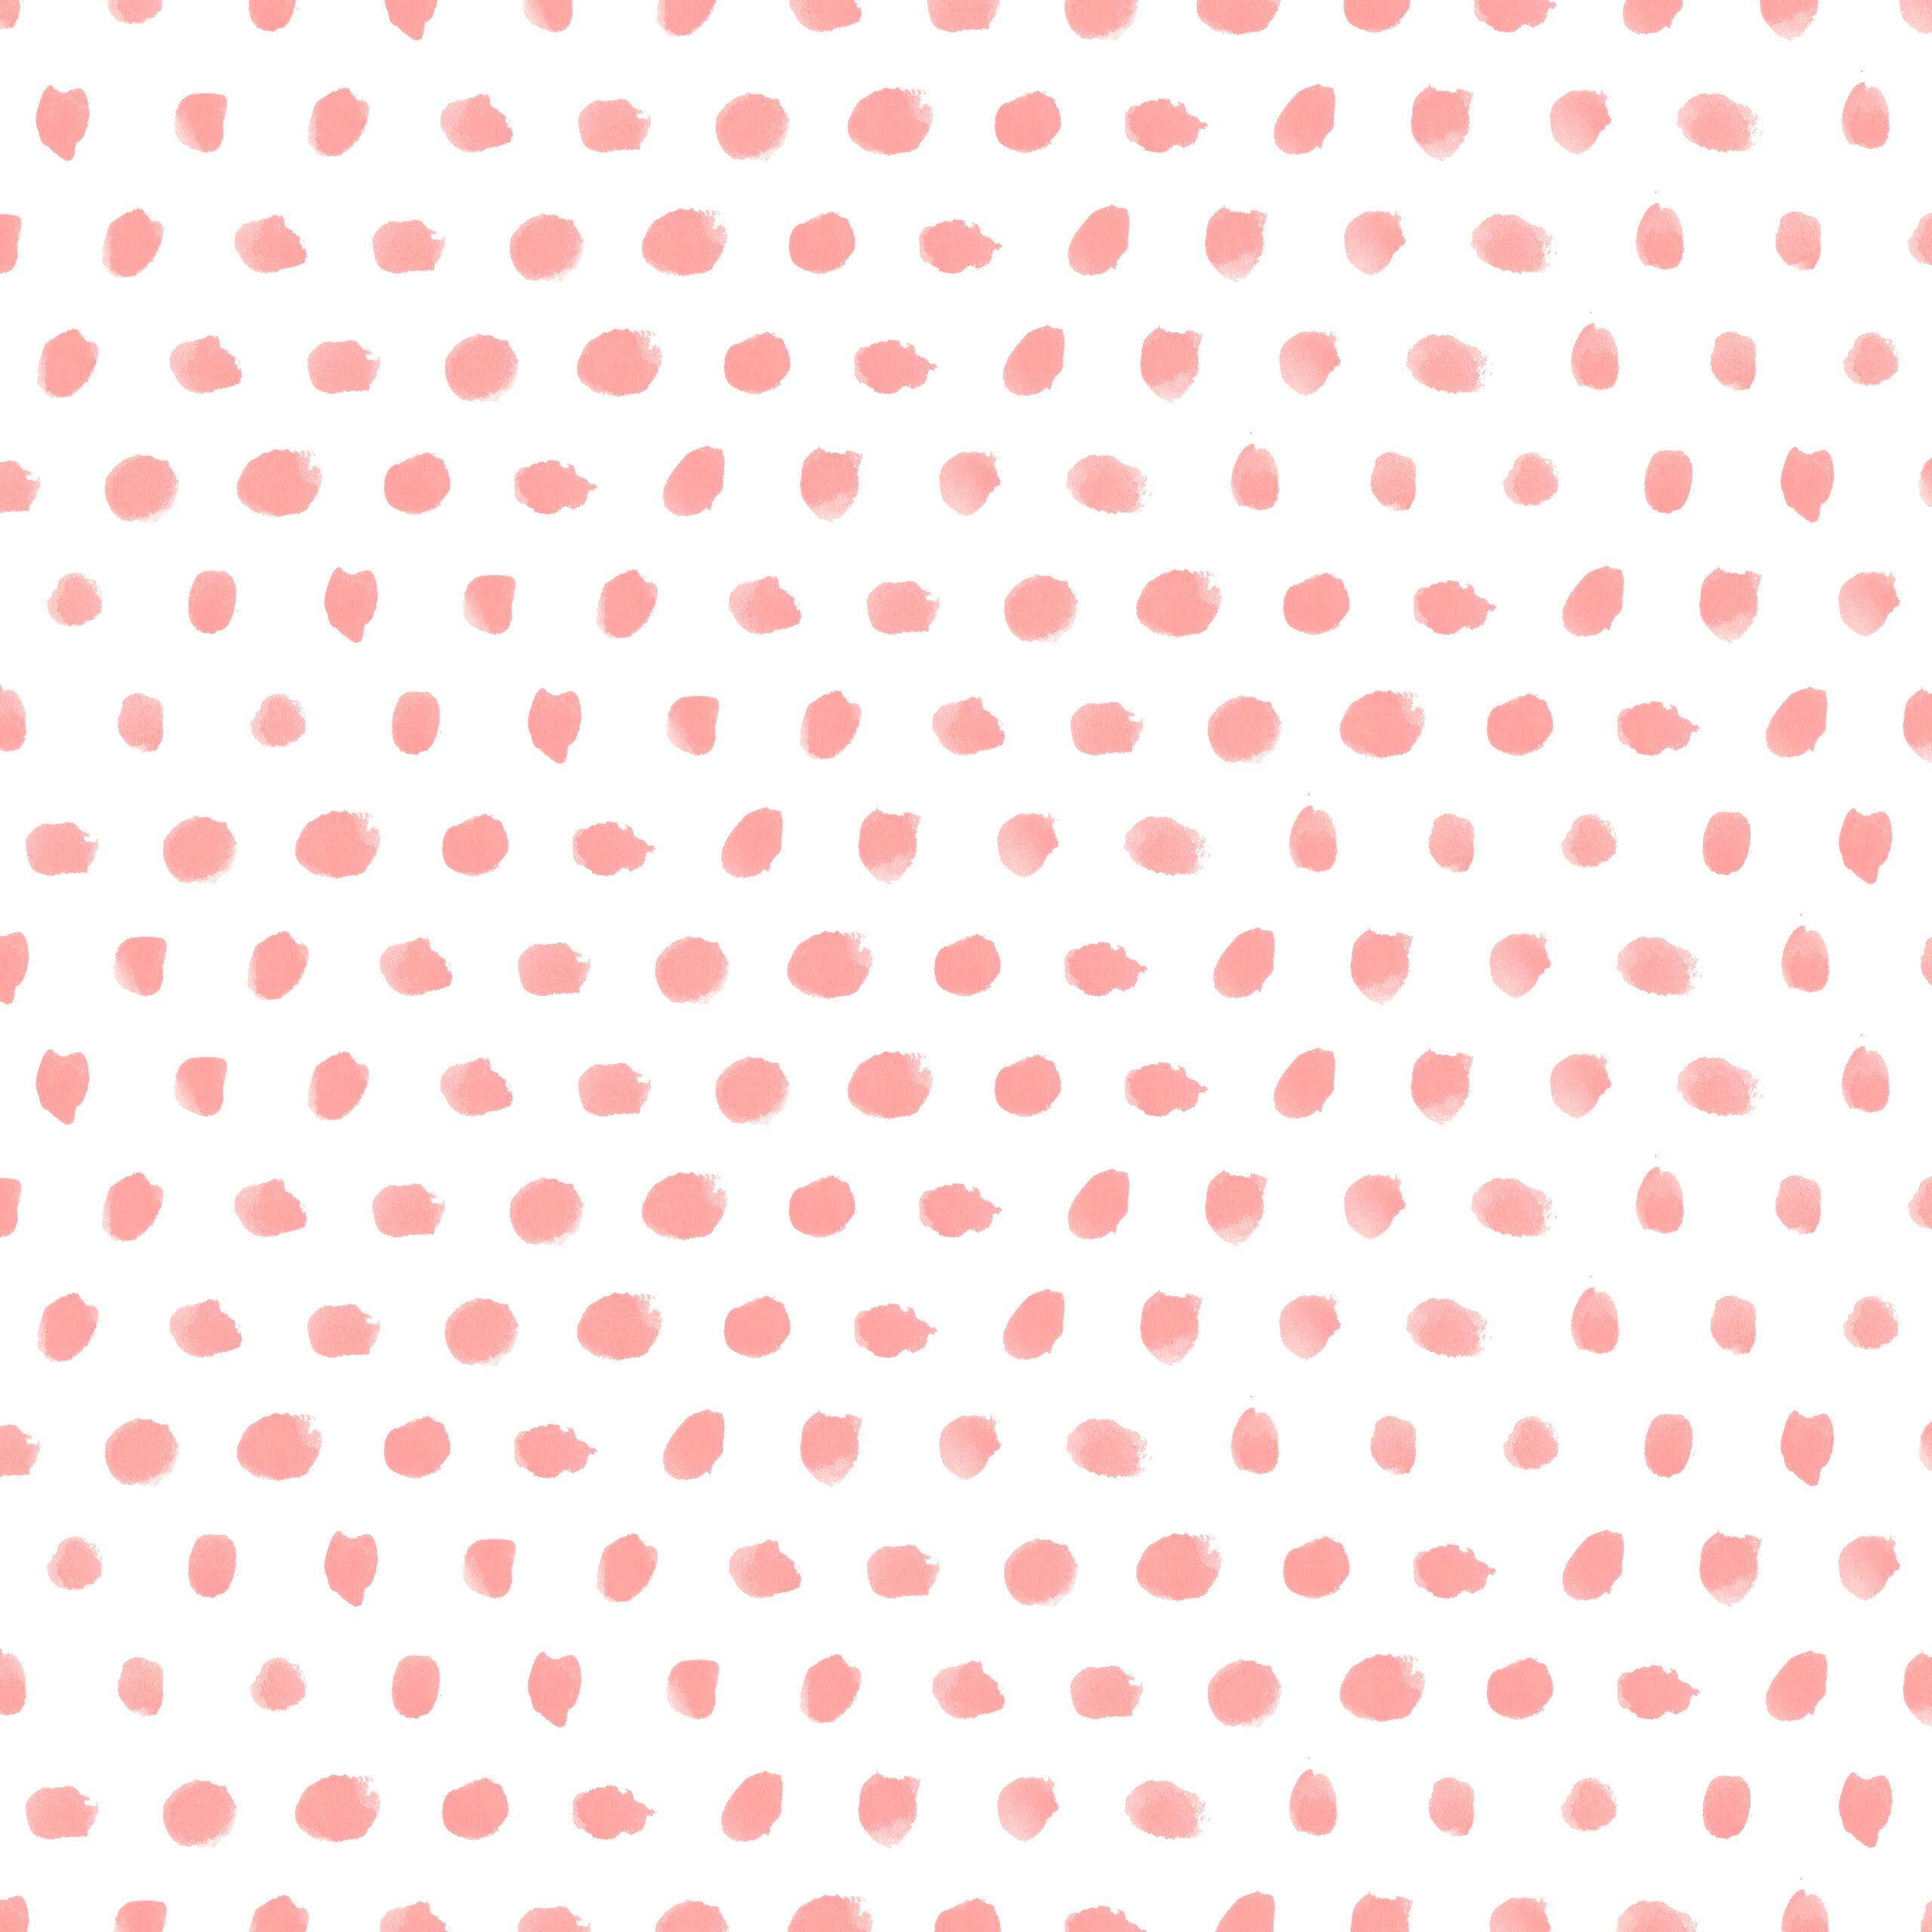 Free Digital Backgrounds Light Rainbow Watercolor Dot Paper